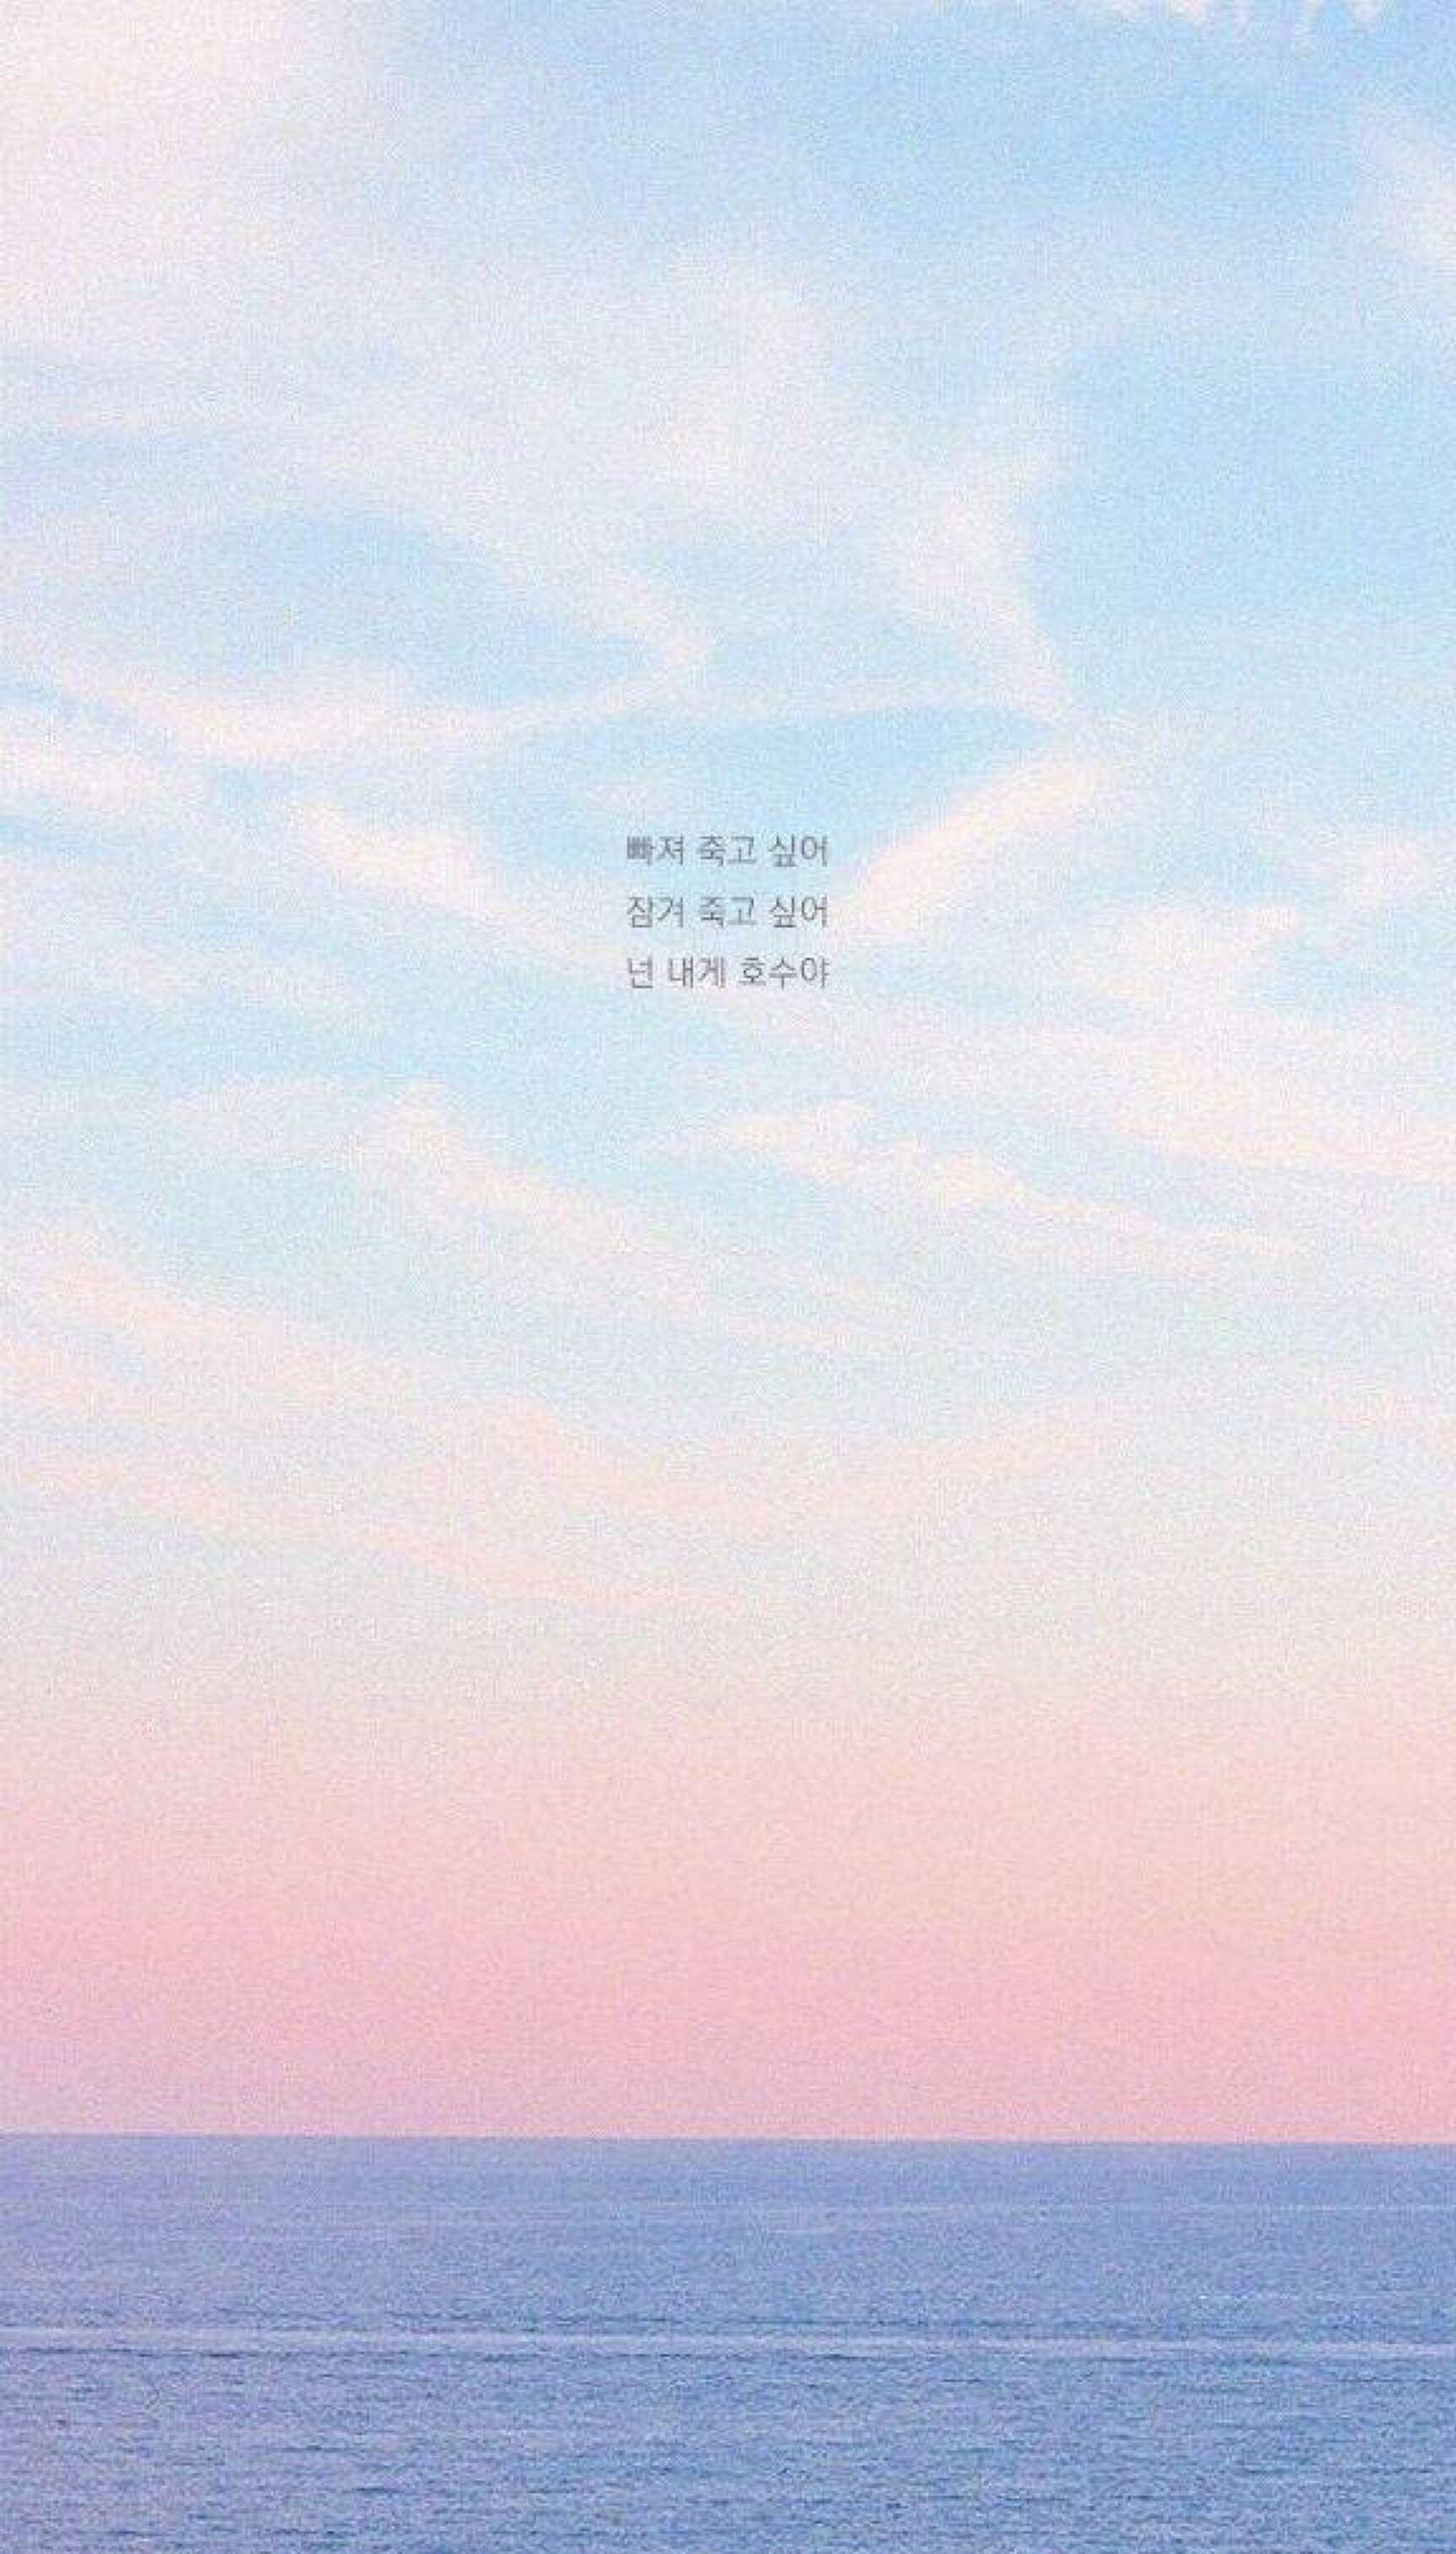 63 aesthetic korean quotes wallpaper wallpaper quotes